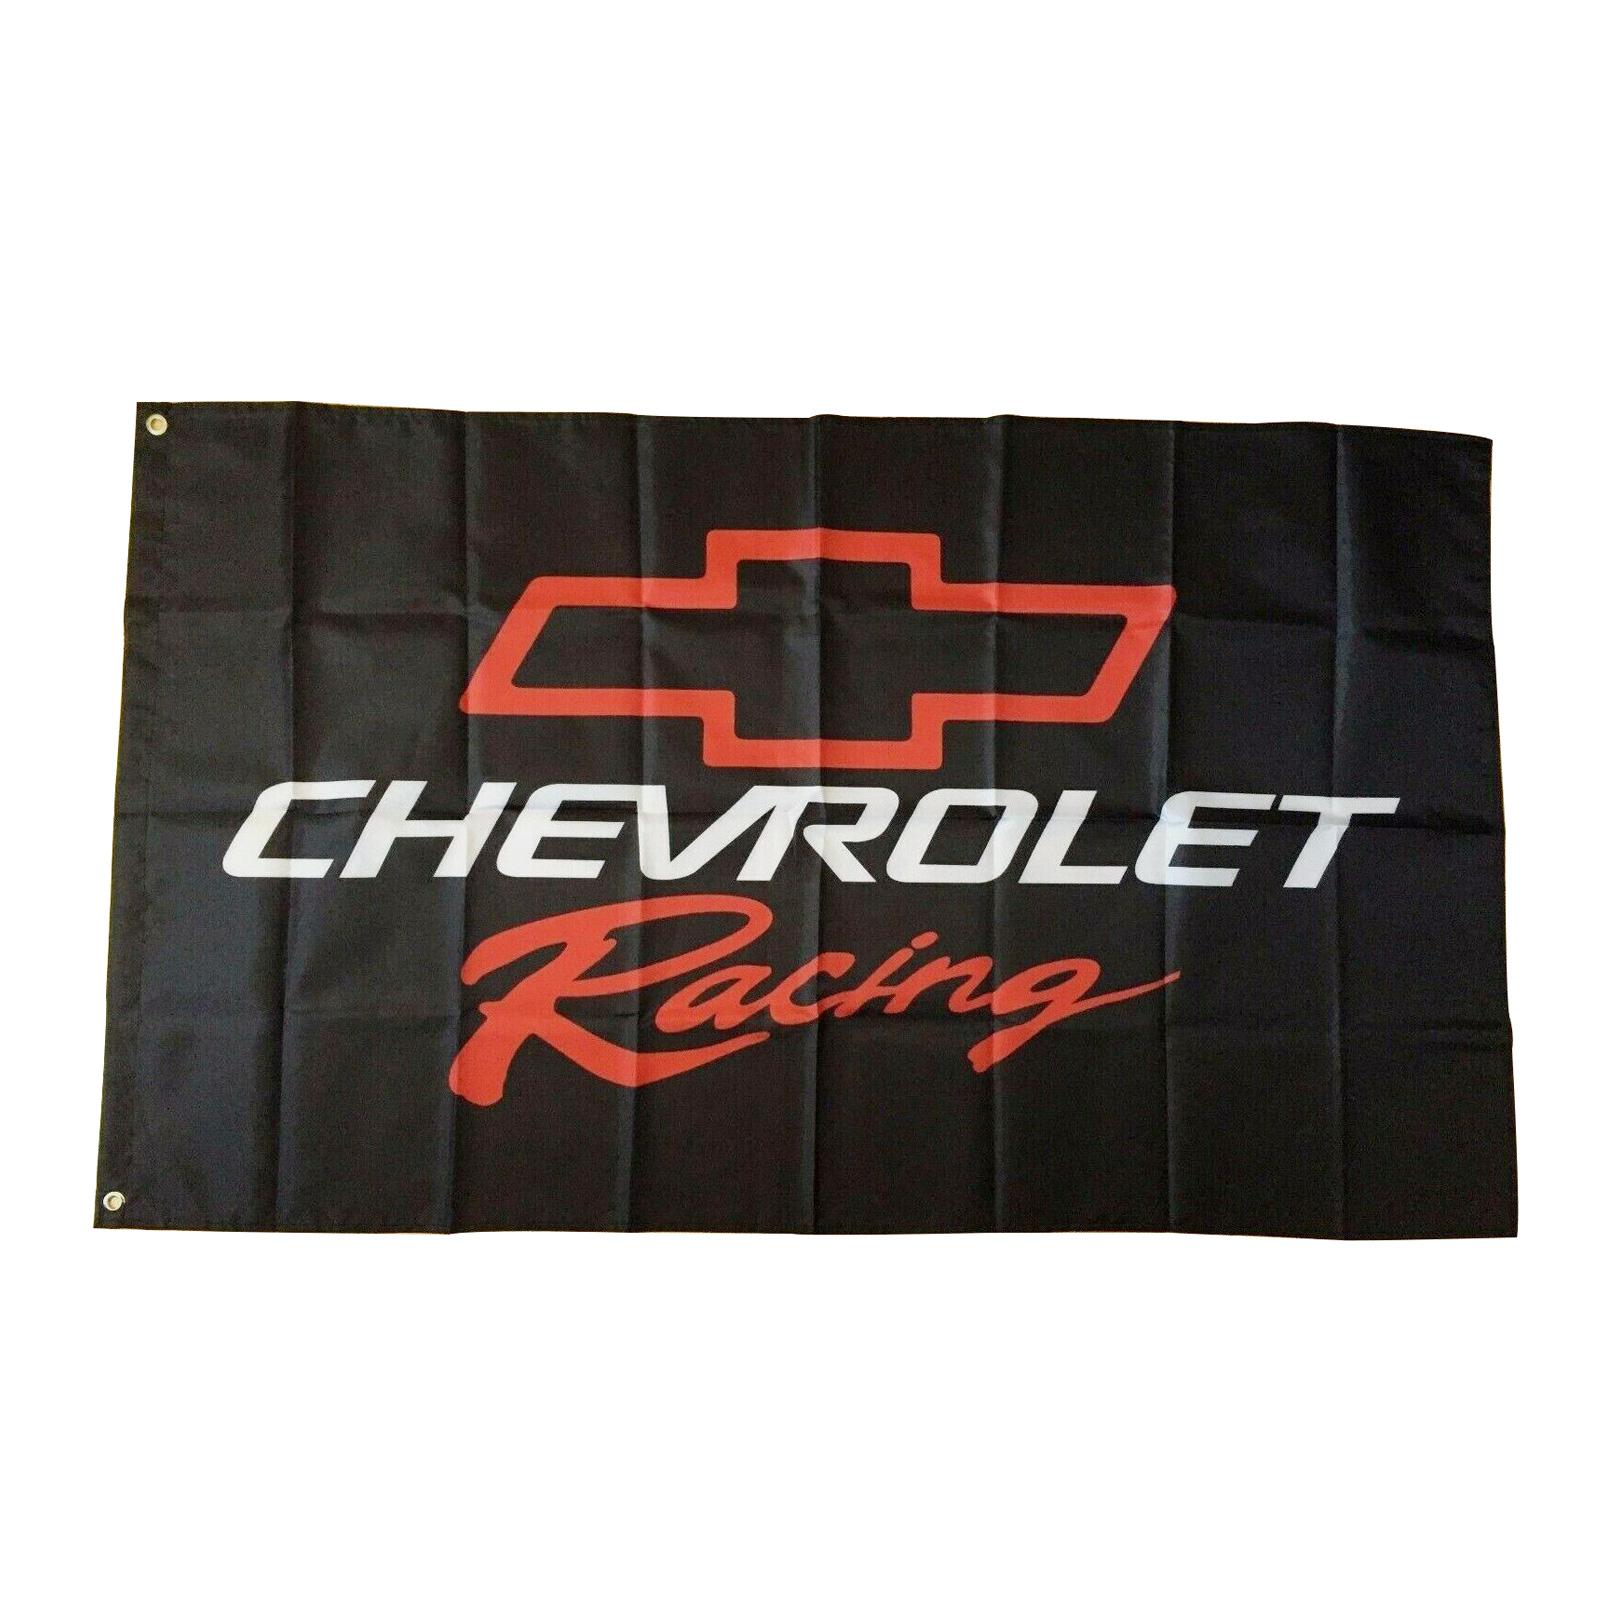 Chevrolet CAMARO Logo Flag Banner 3x5 ft Racing Car Show Garage Wall Decor Sign